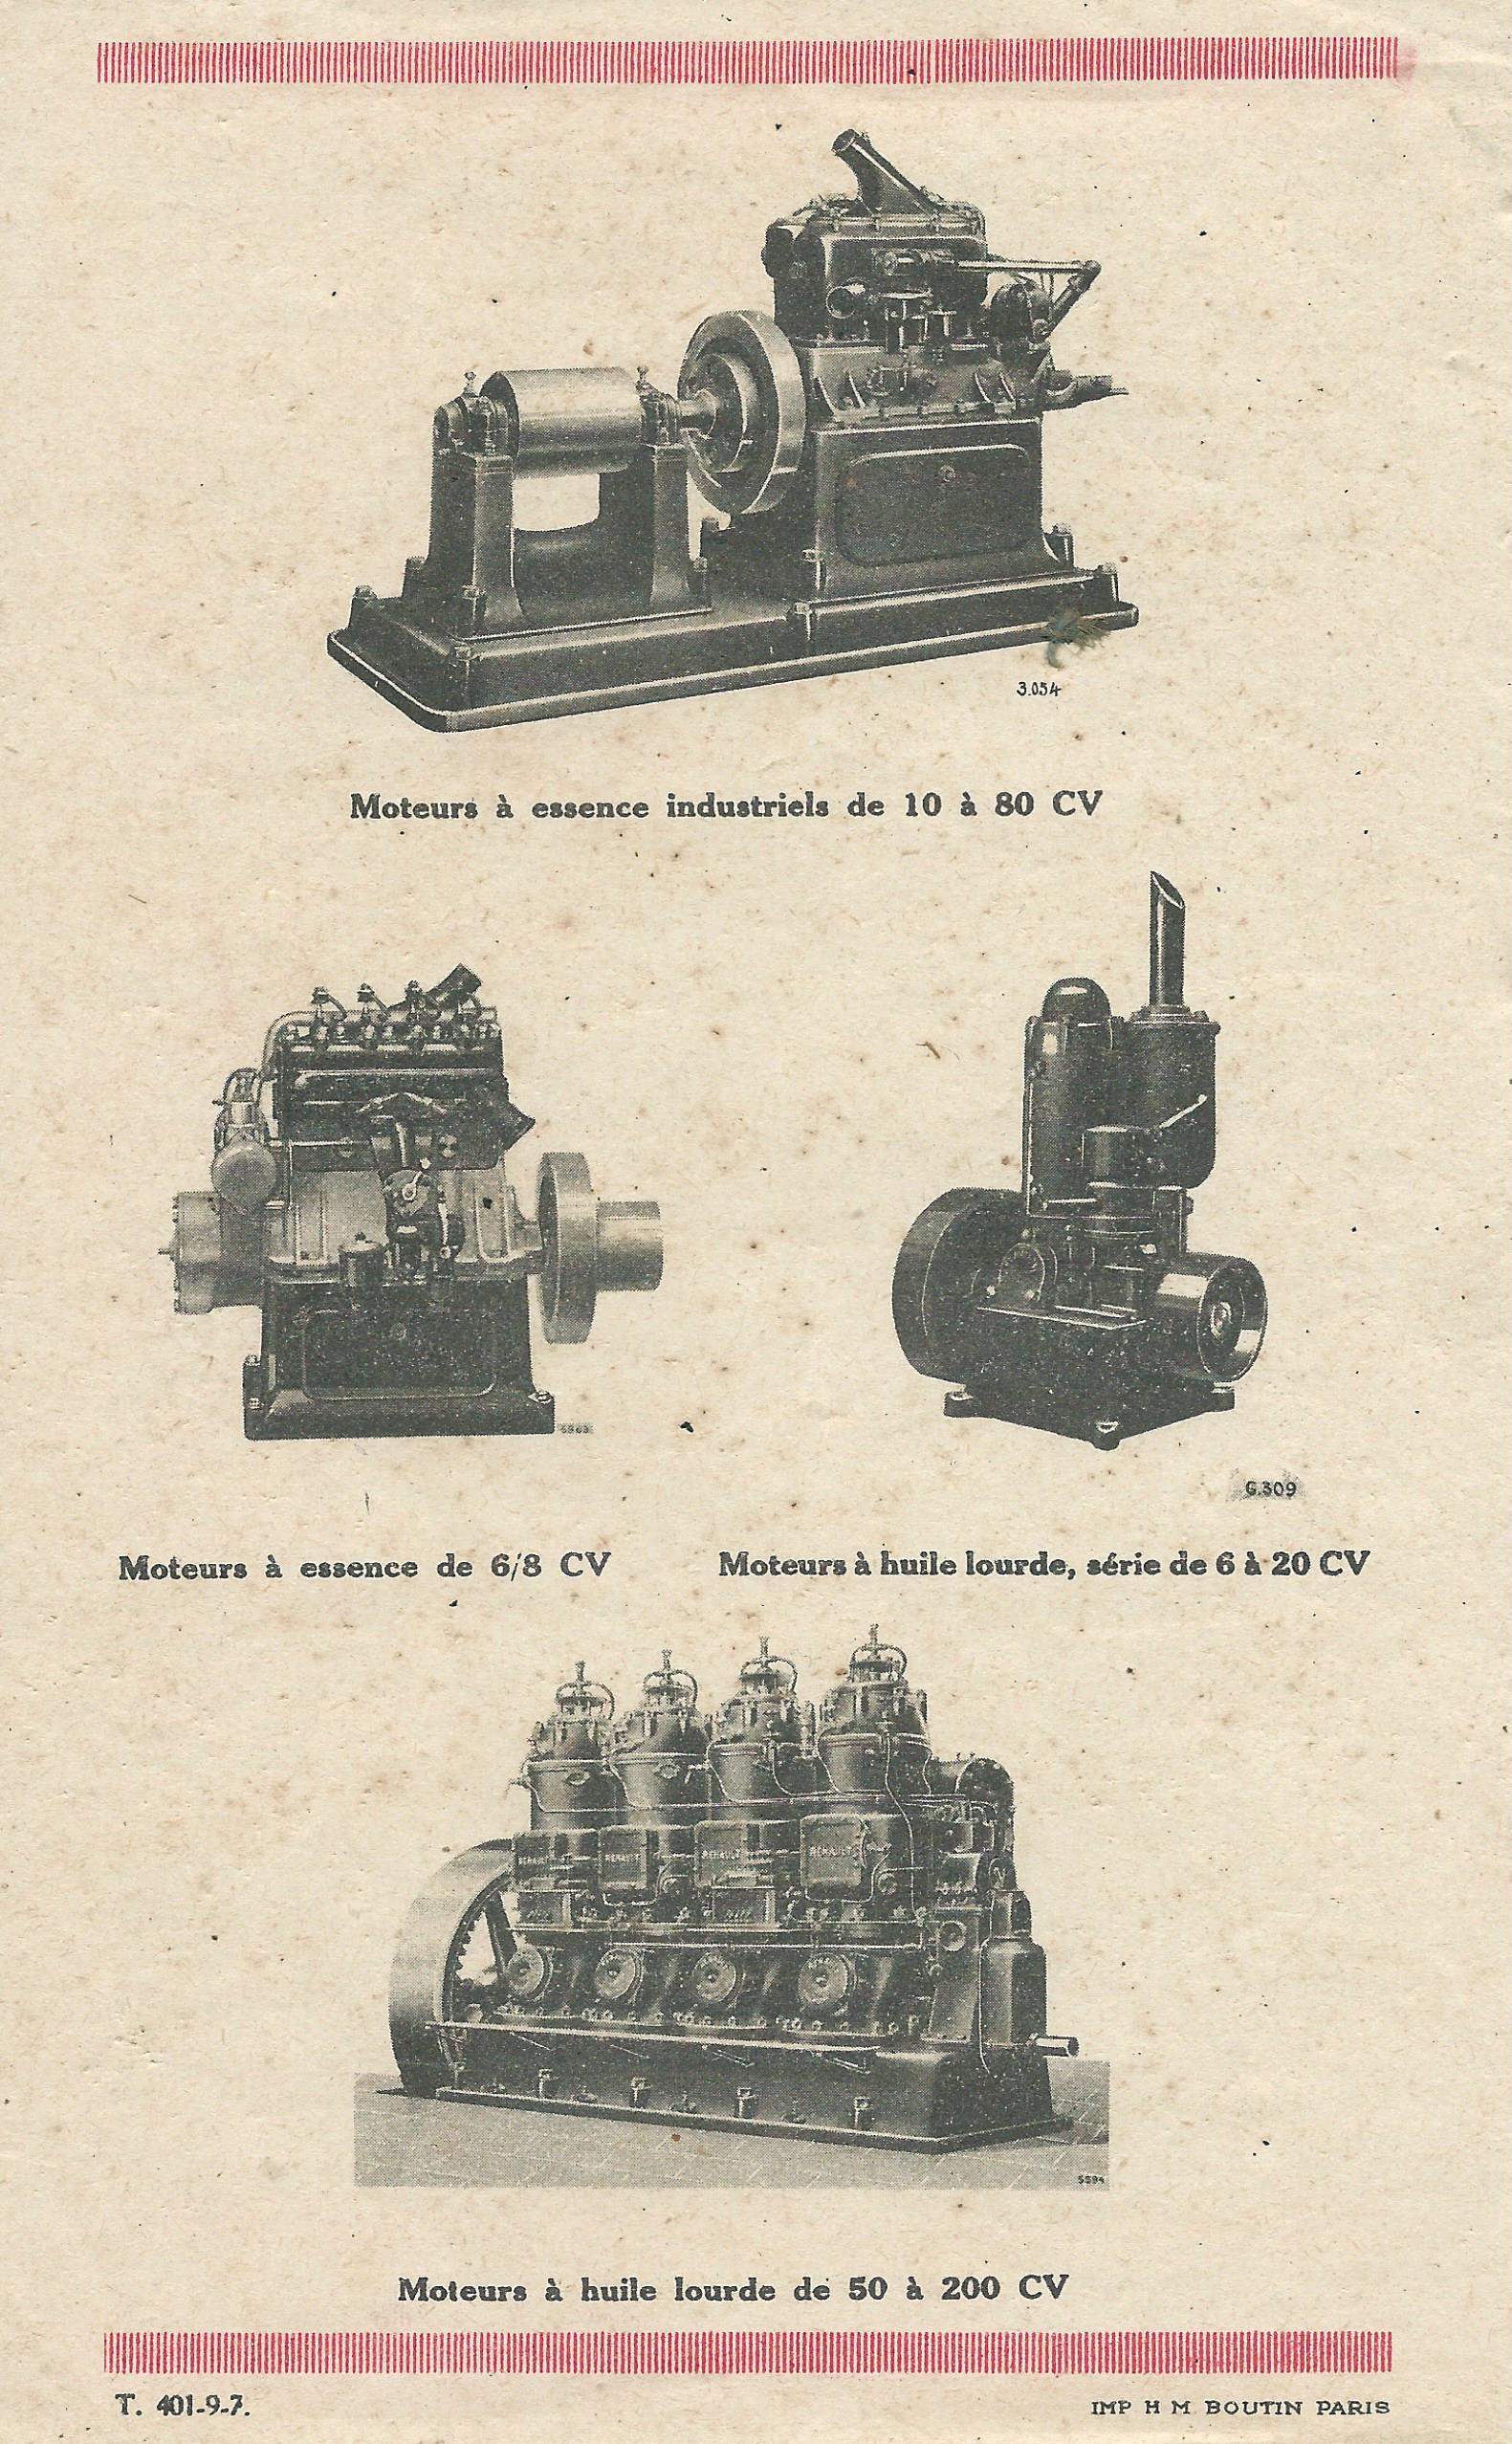 RENAULT - moteur renault 263 546919RENAULTmoteursfixes1927008